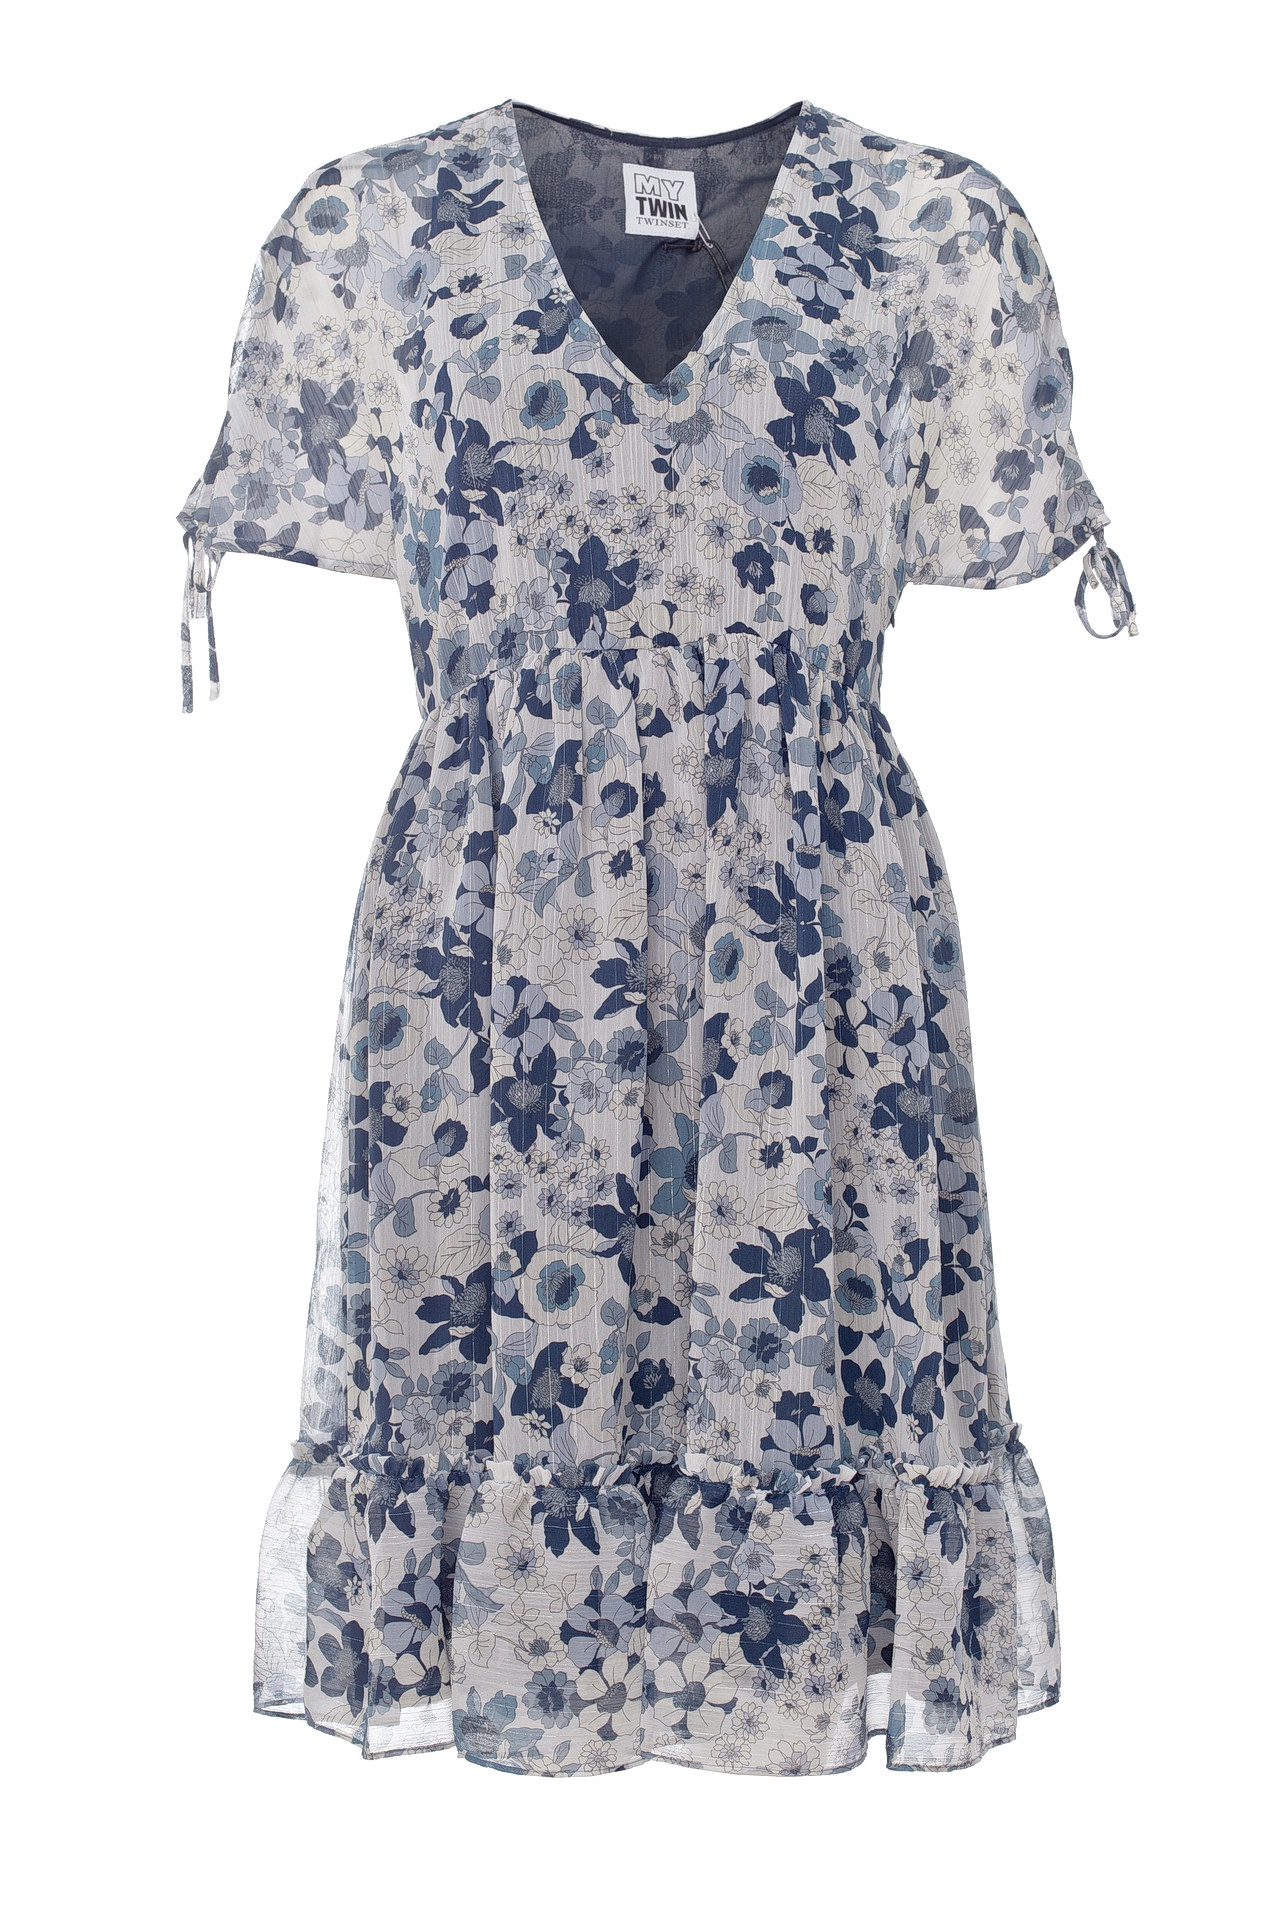 Платье TWIN-SET mo вентилятора mofi 2 huawei rongyao ping защитный рукав кобуры пластина 8 дюймов jdn w09 al00 вызова tablet пакет рукав темно синий